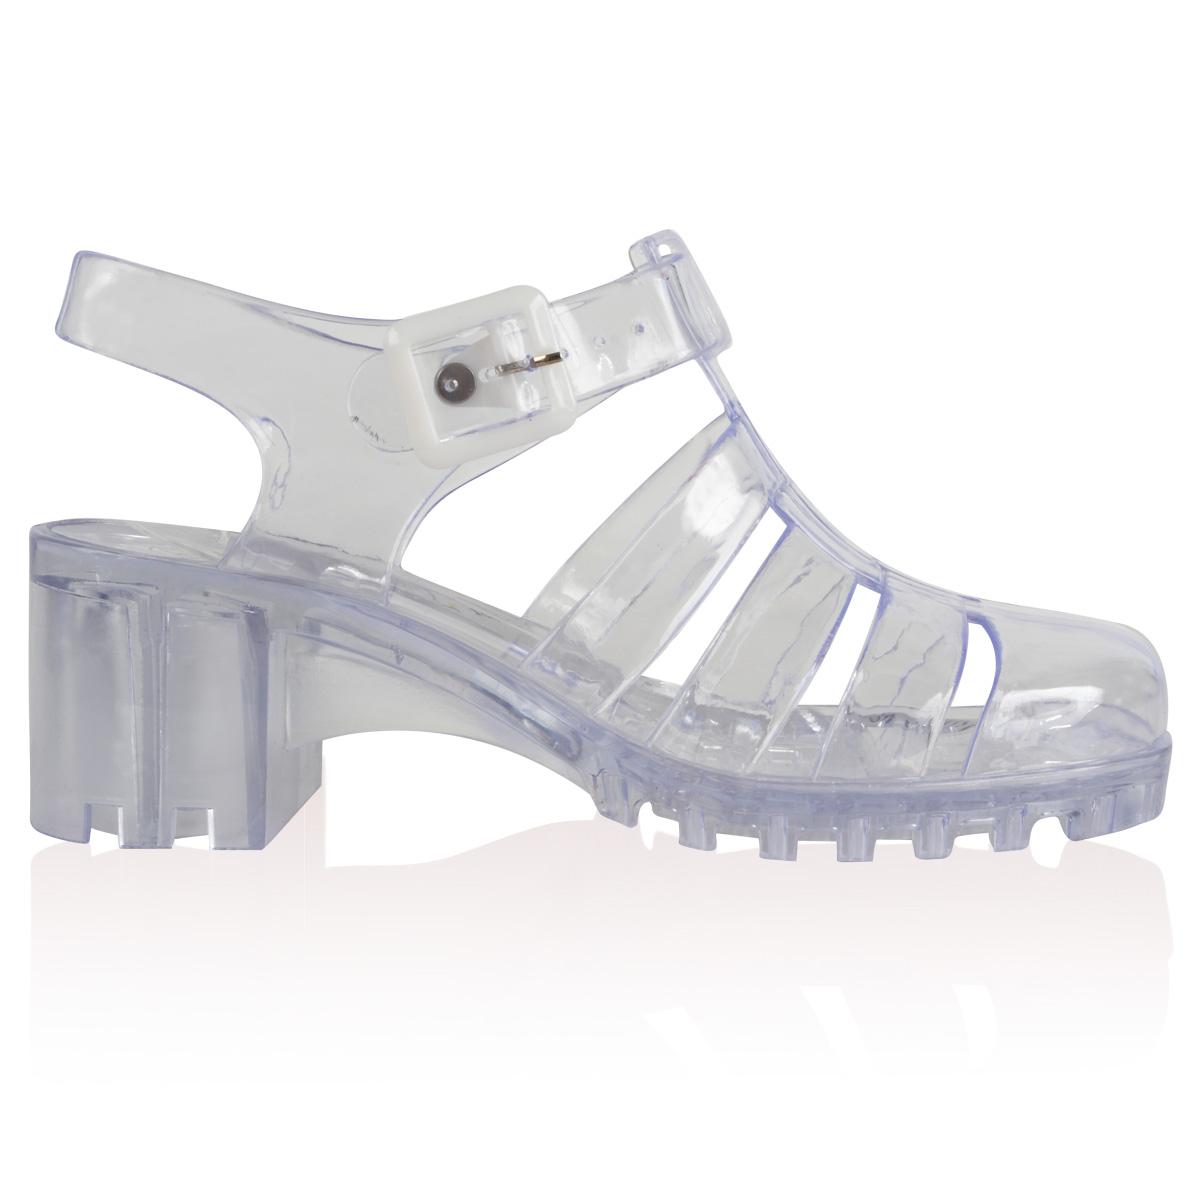 N.Y.L.A. Shoes Zasha - Women's Jelly Shoes from Shoebuy.com at SHOP.COM